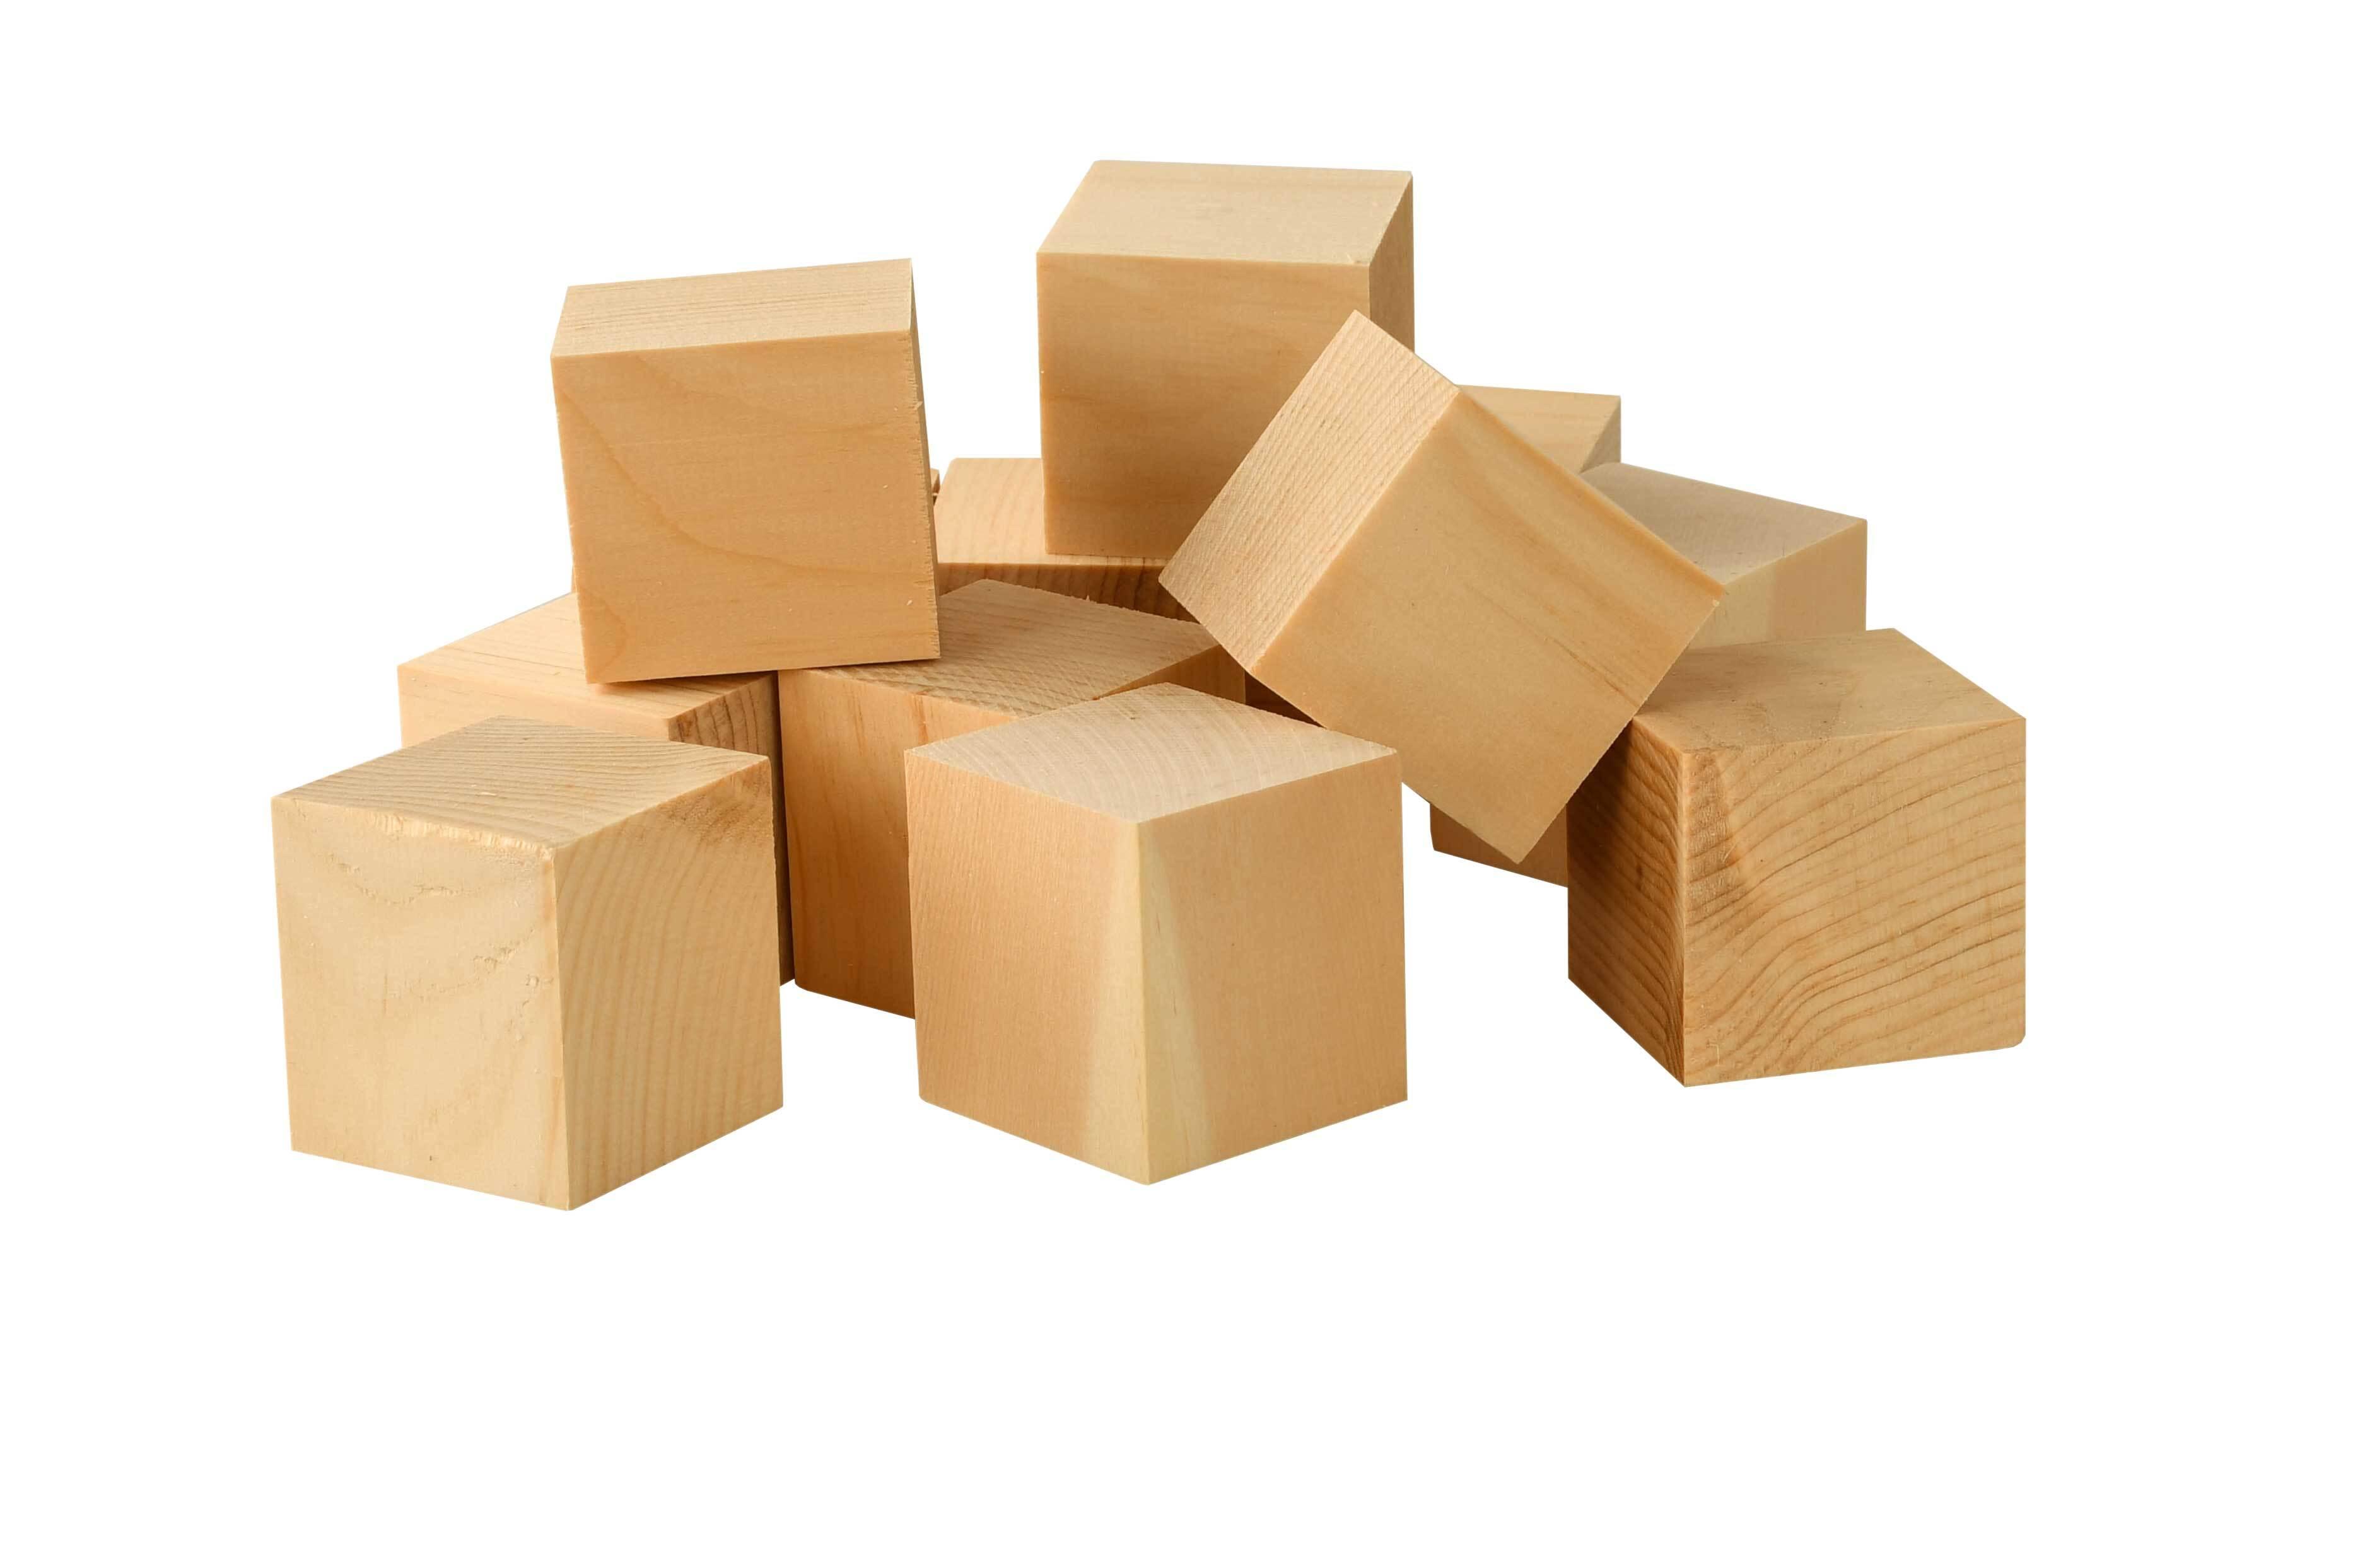 Houten blokjes alpenden, 20 st., 4,2x4,2x4,2 cm